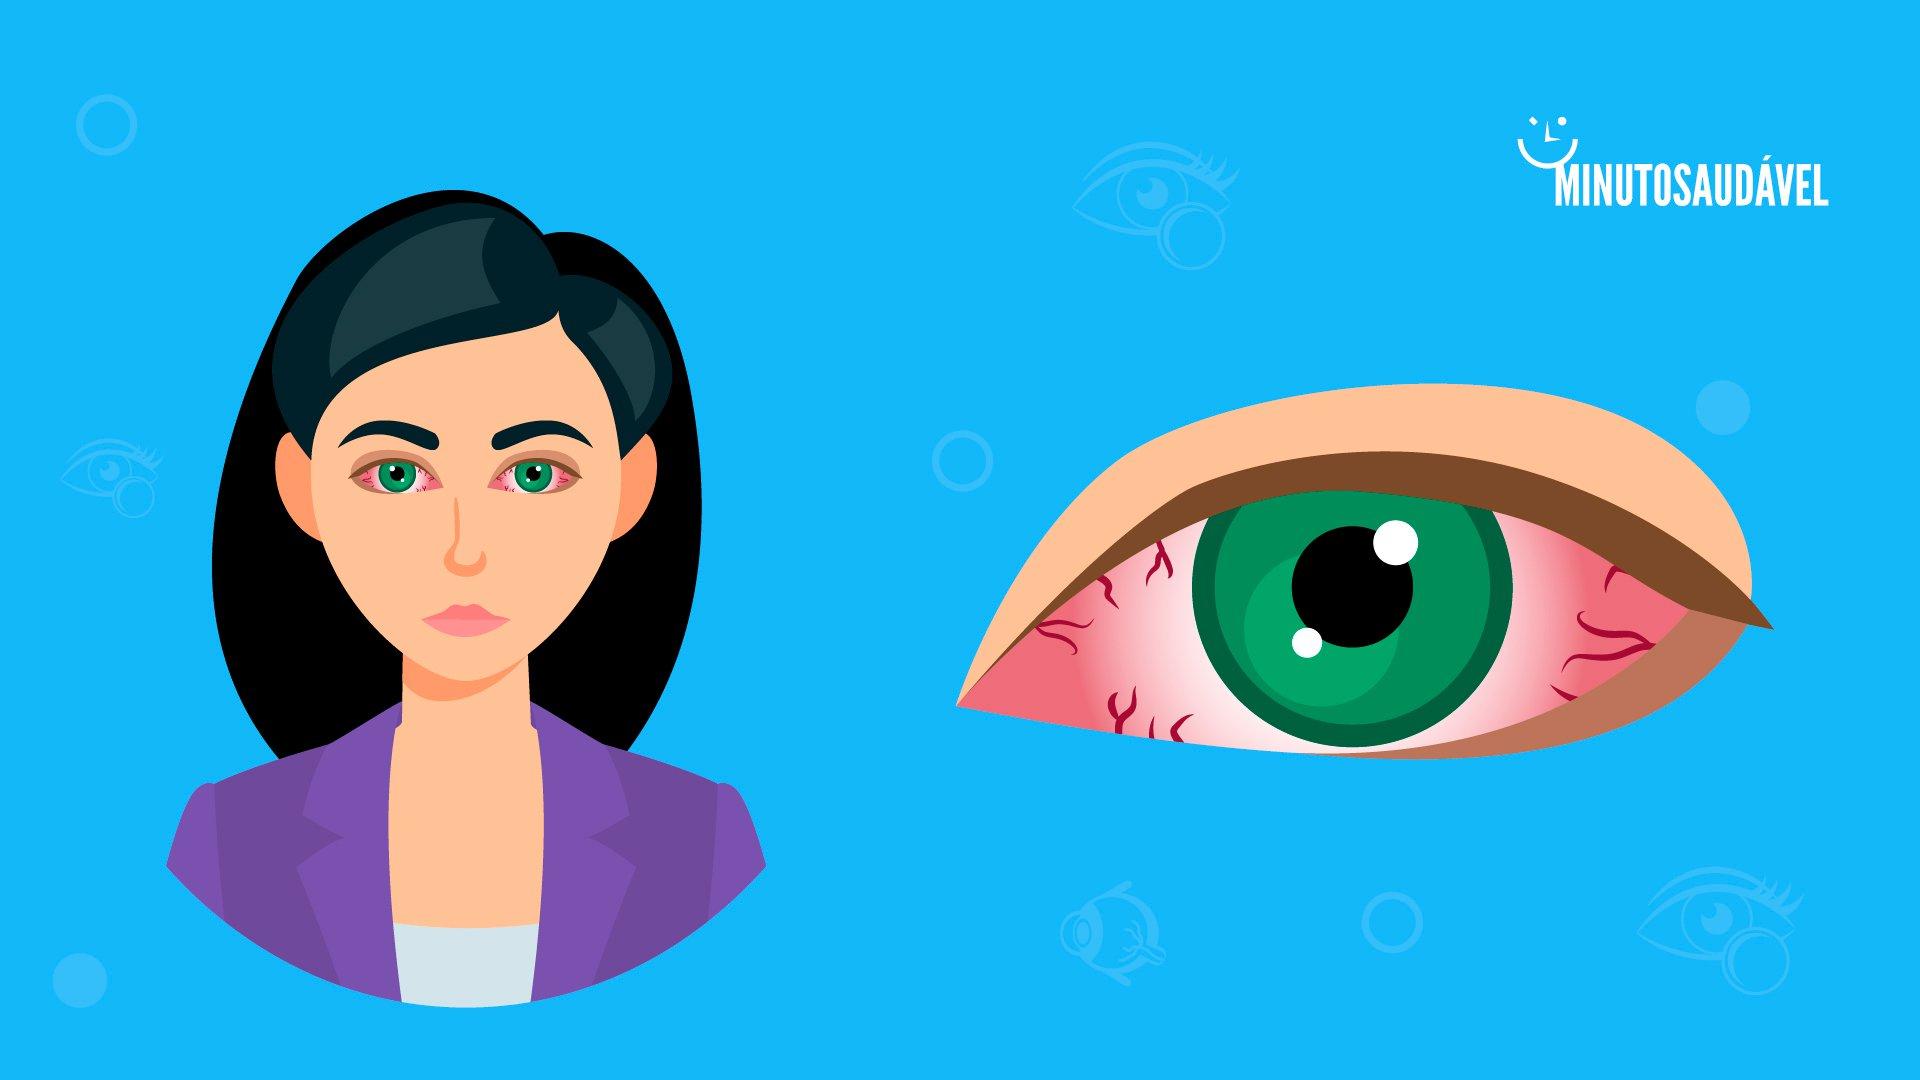 c687e0279 Síndrome do olho seco: sintomas, causas, tratamento e colírios   MS